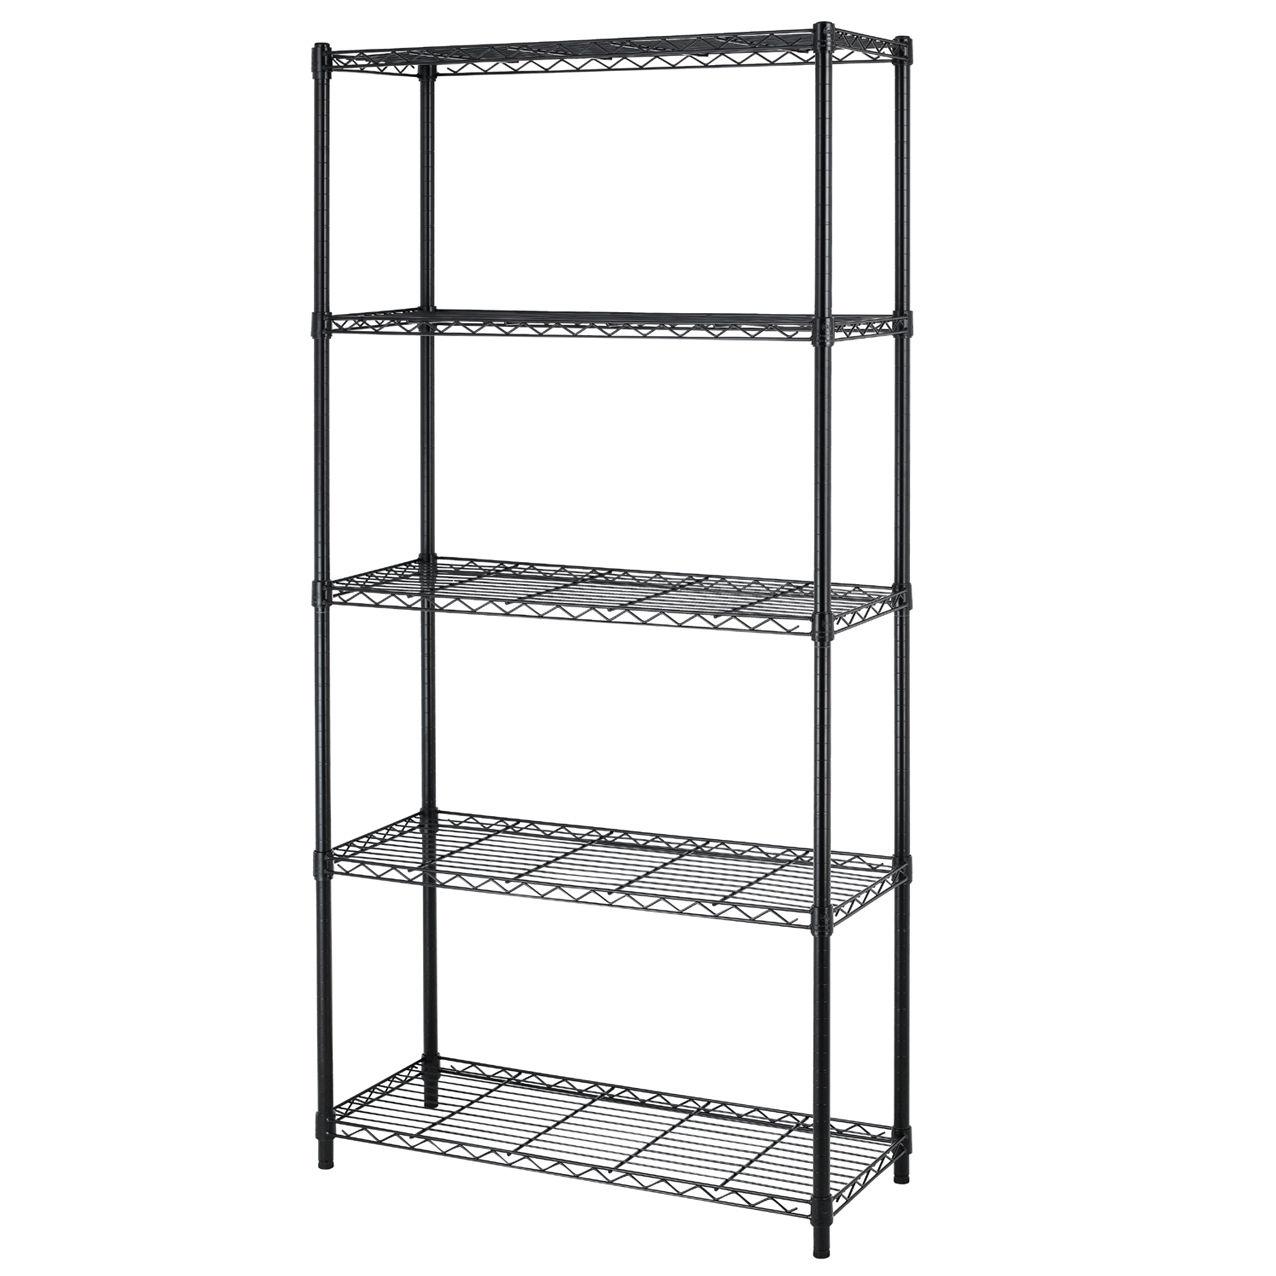 5 Shelf Adjustable Steel Wire Metal Shelving Rack Sale 39 99